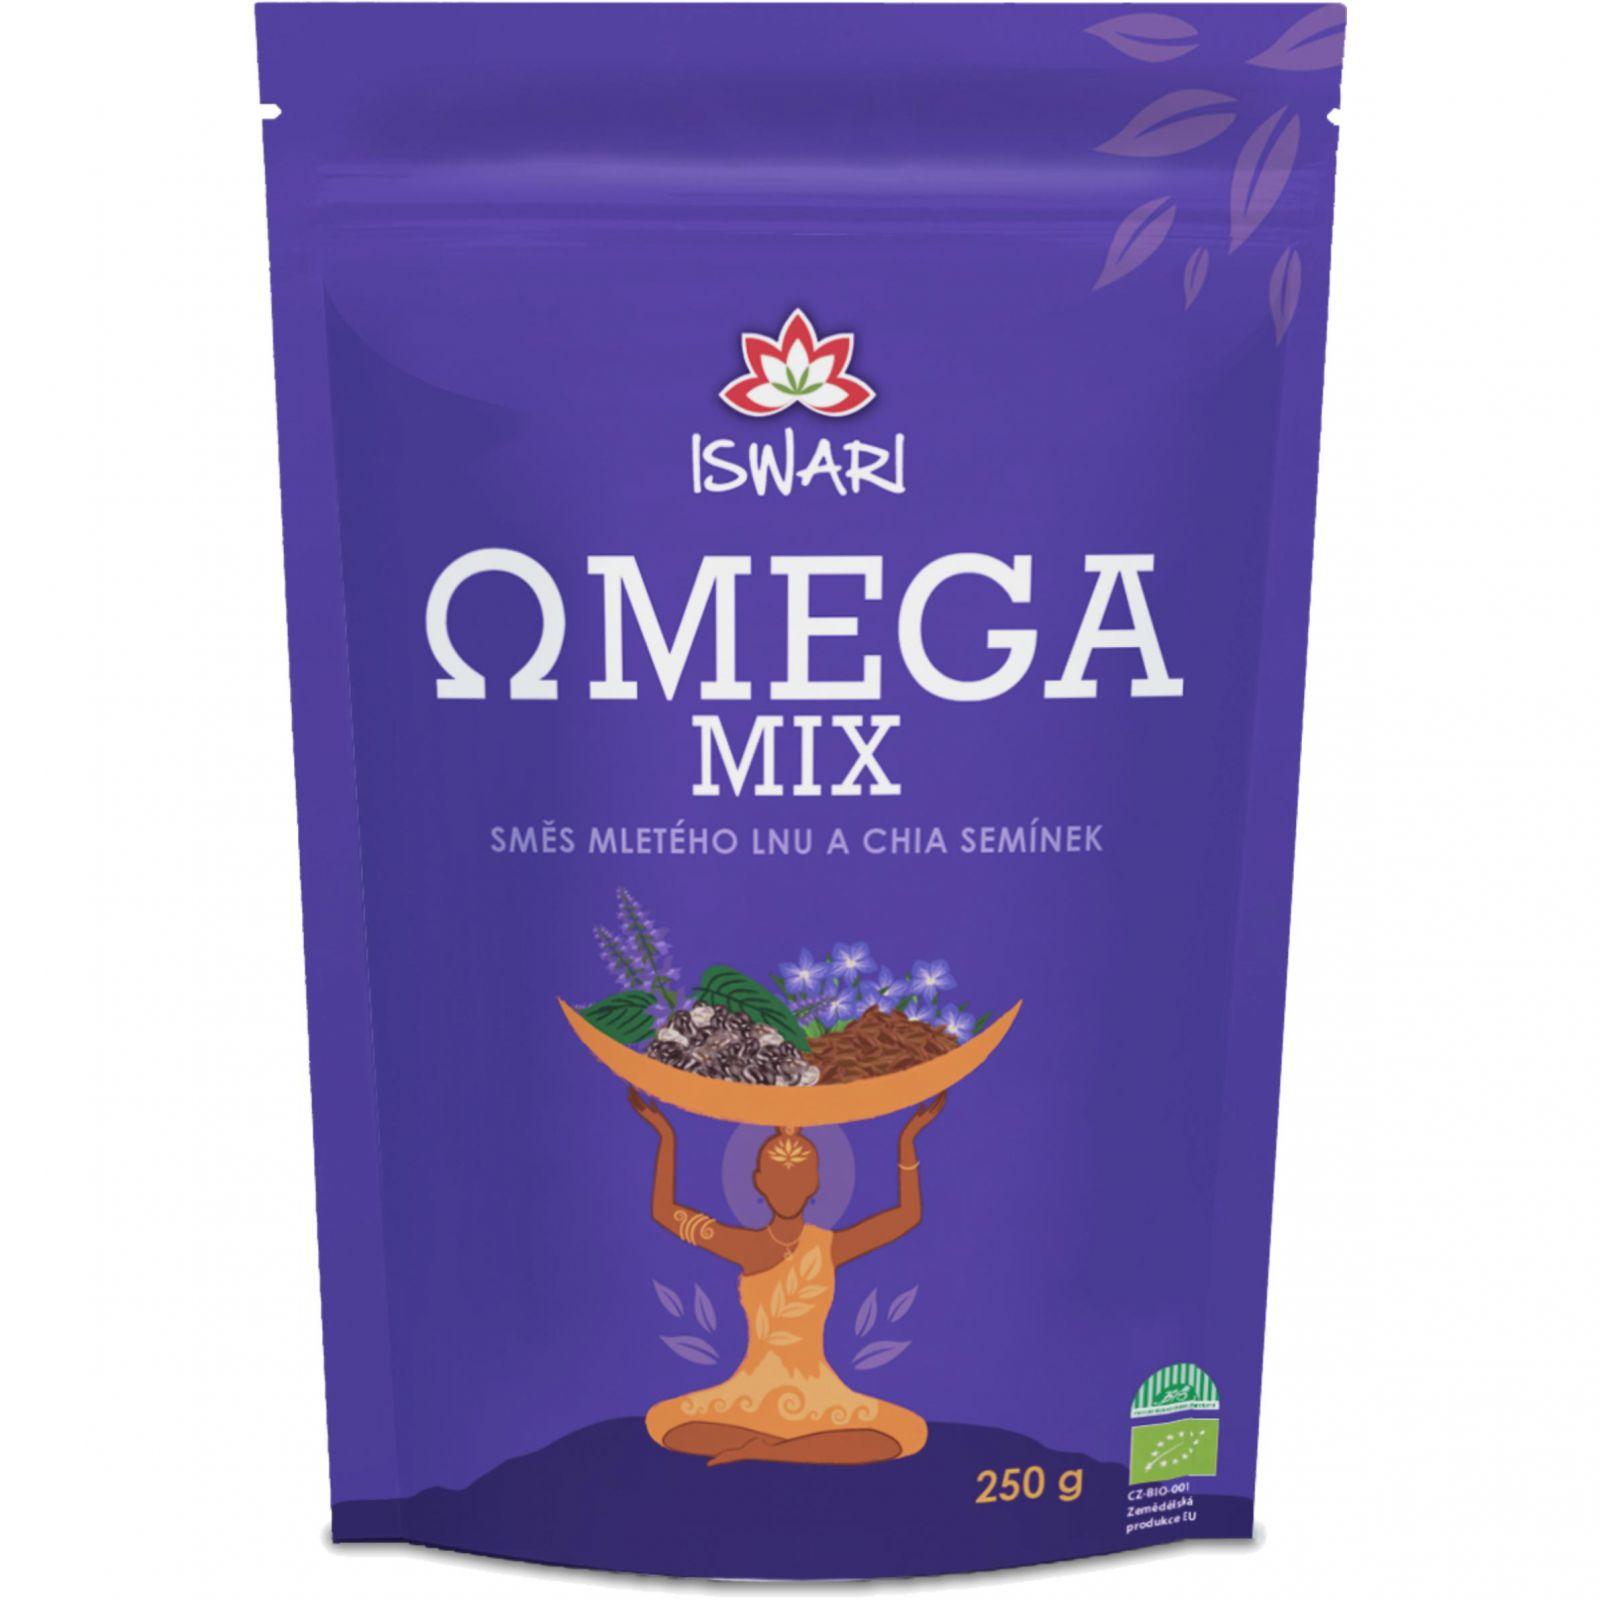 Iswari Omega Mix 250 g